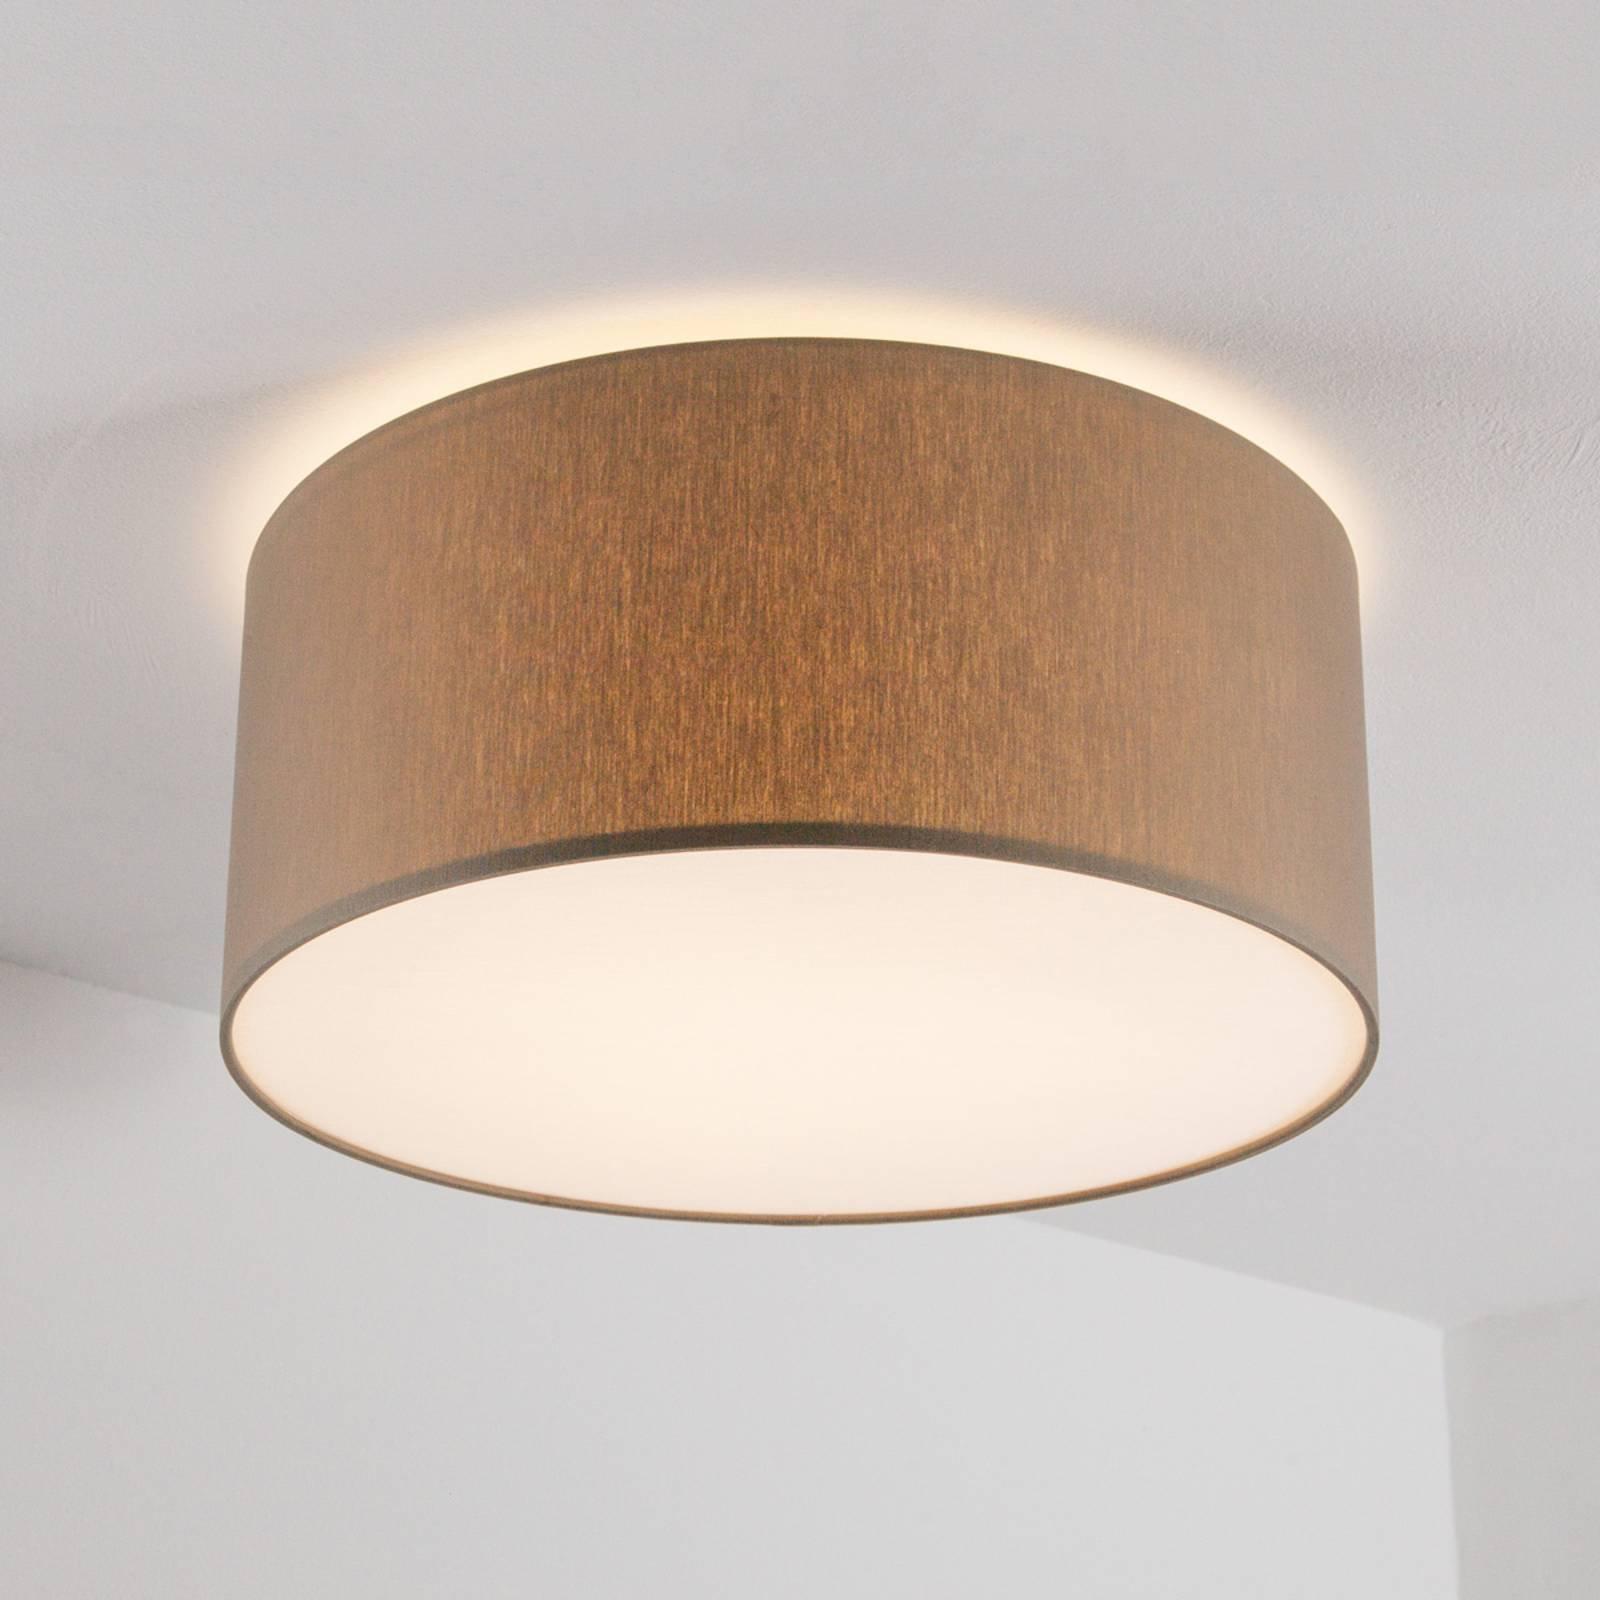 Gråbrun taklampe Mara, 40 cm